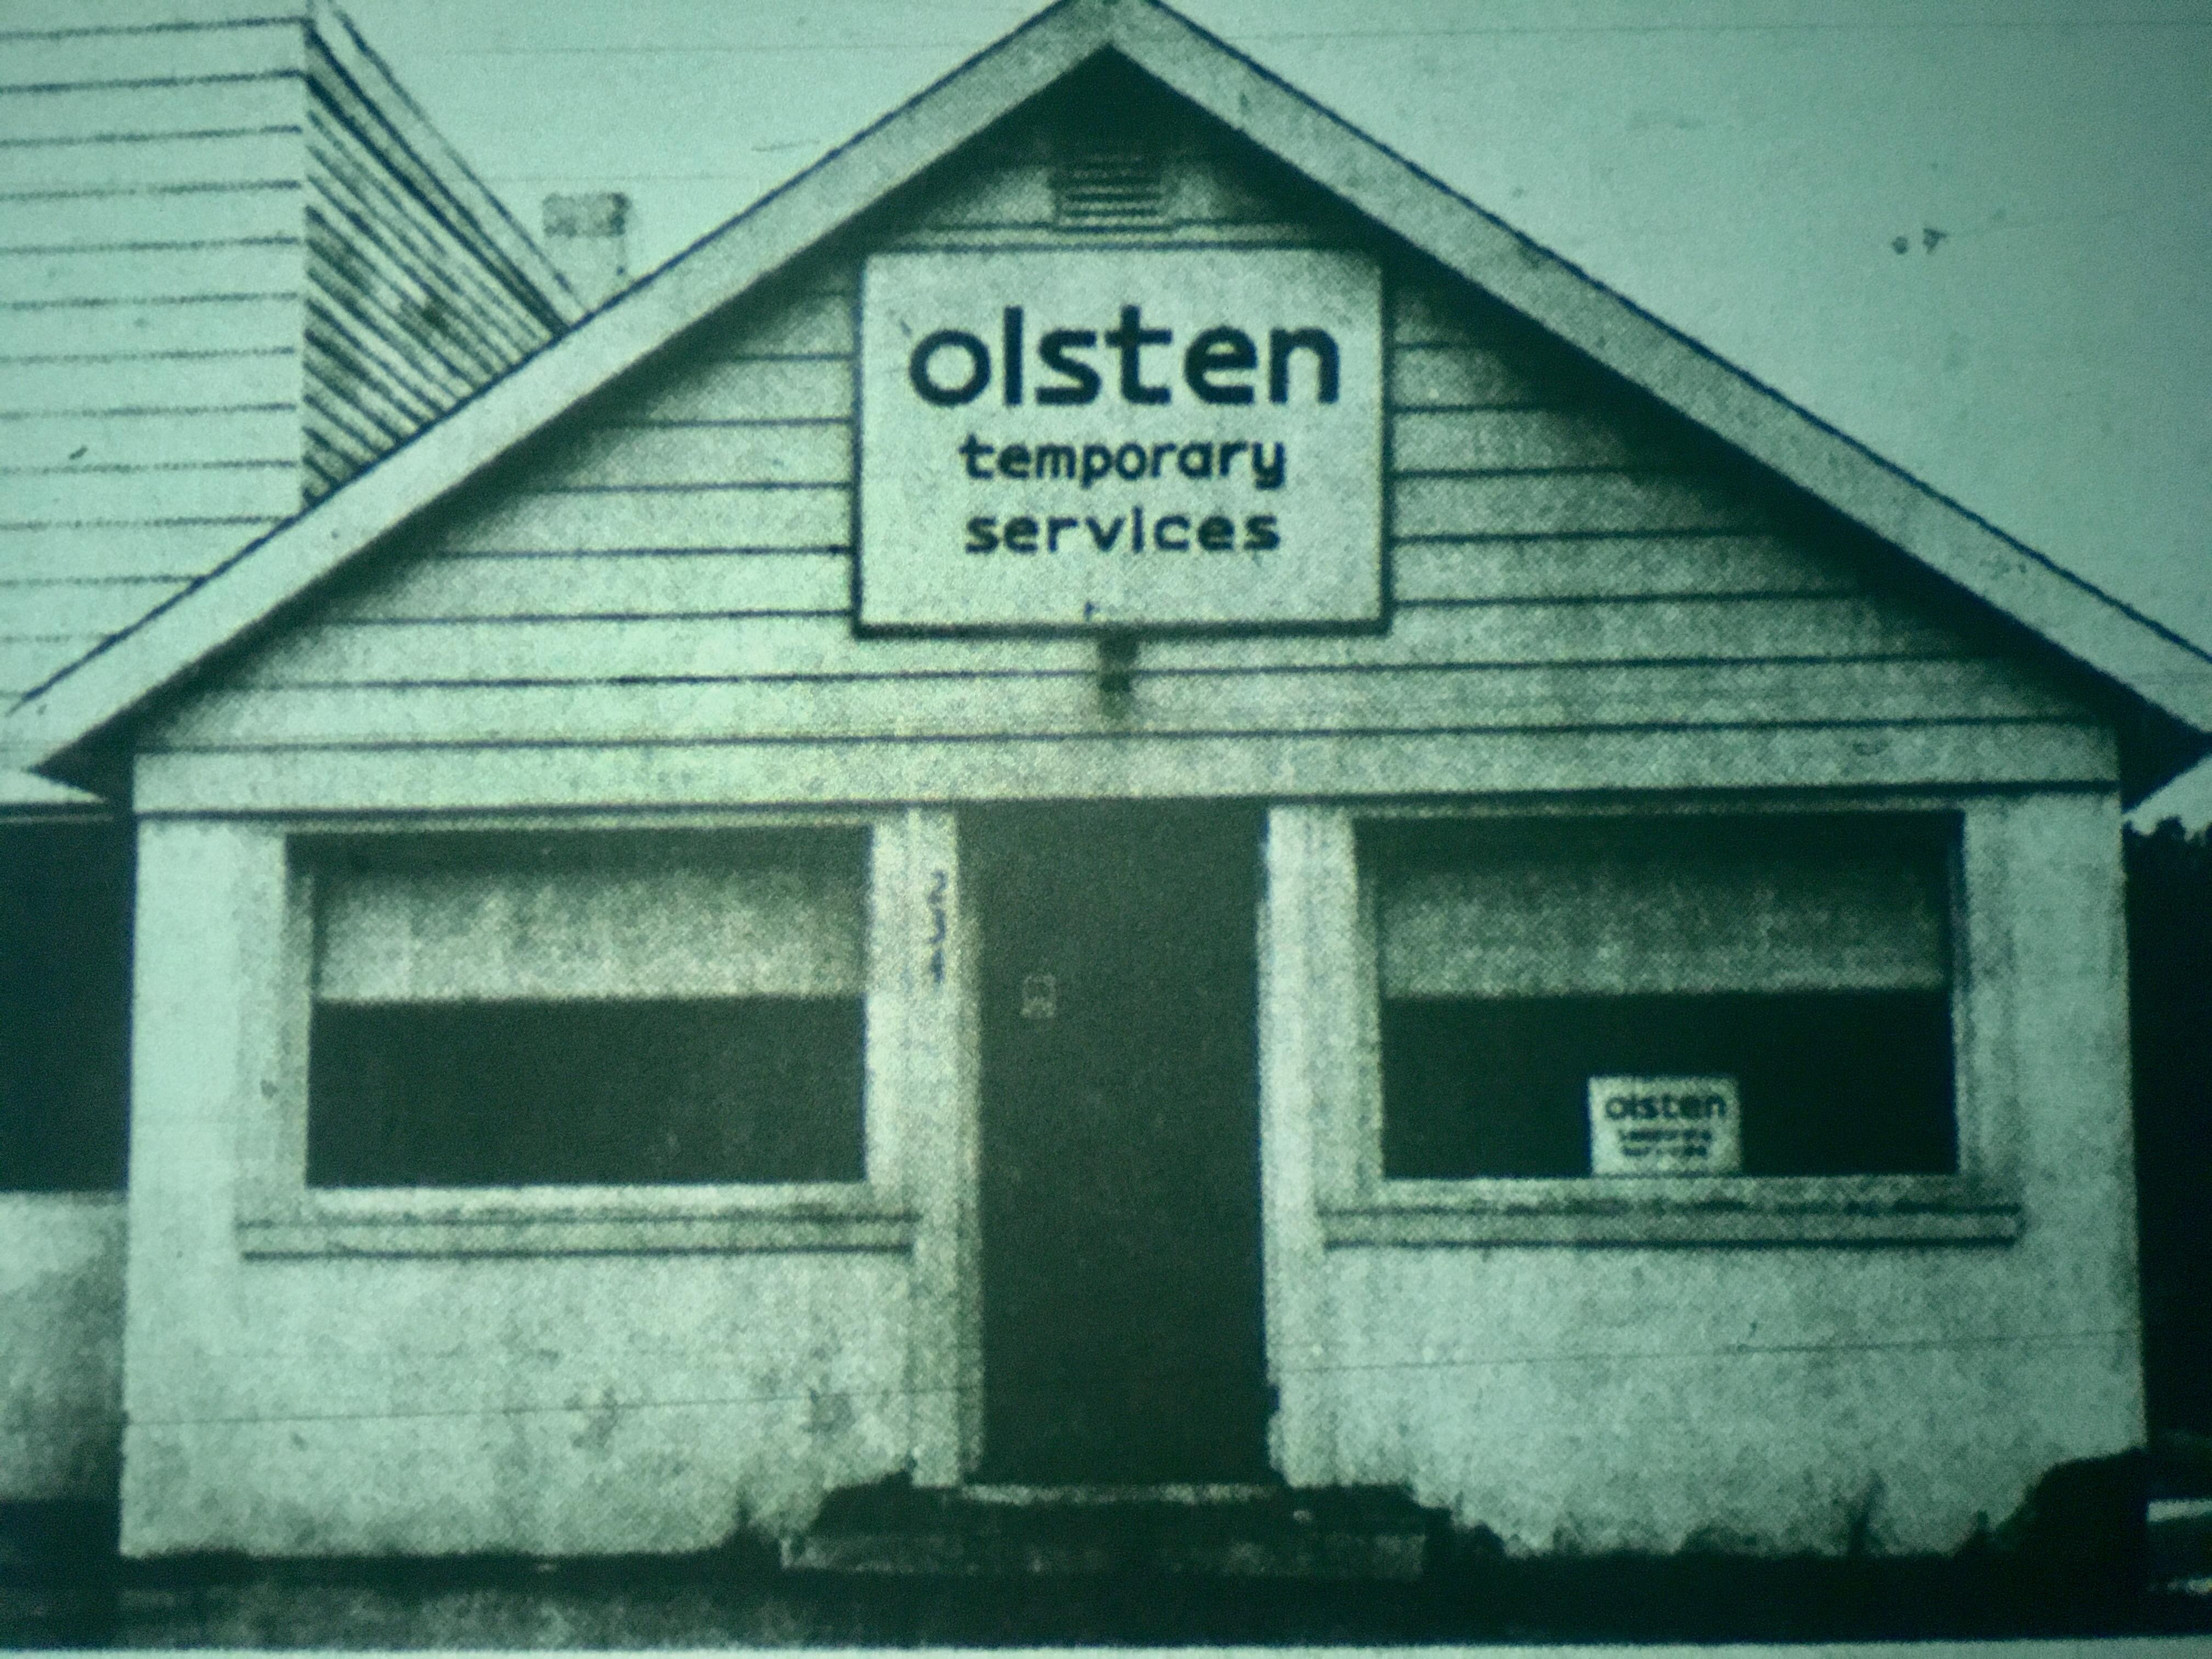 Olsten Temporary Services Burlington